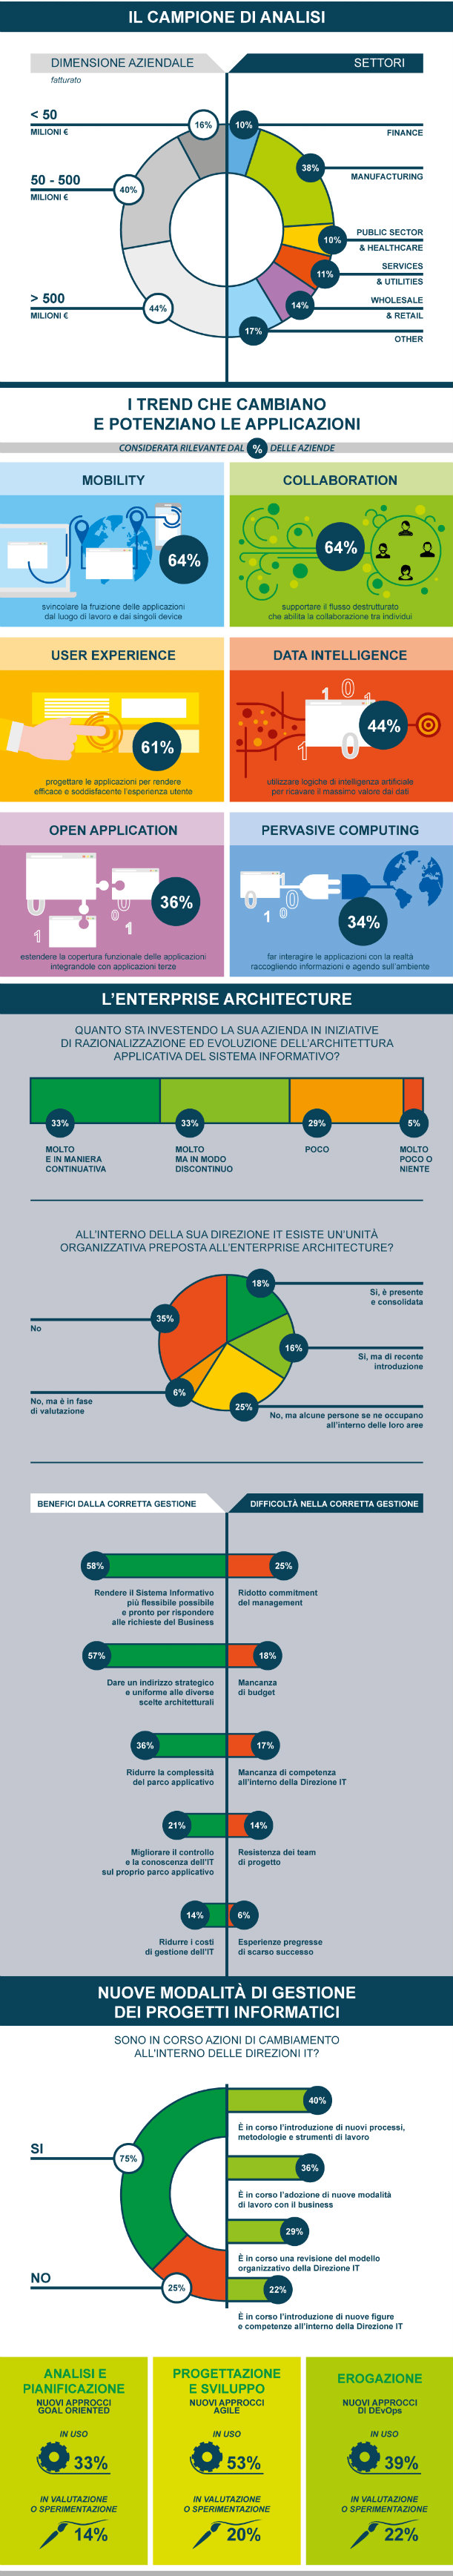 Infografica I